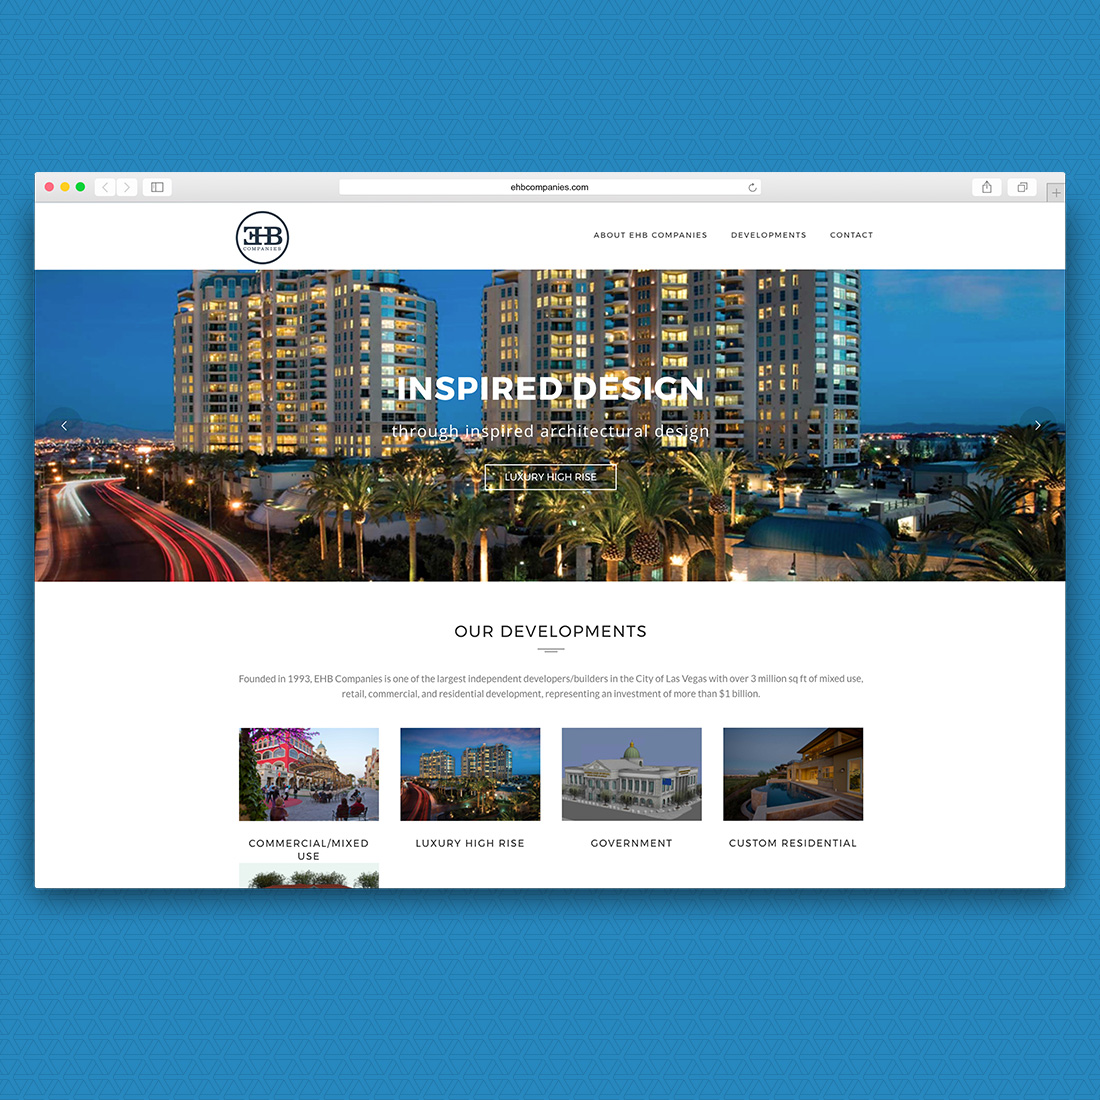 EHB Website Home Page